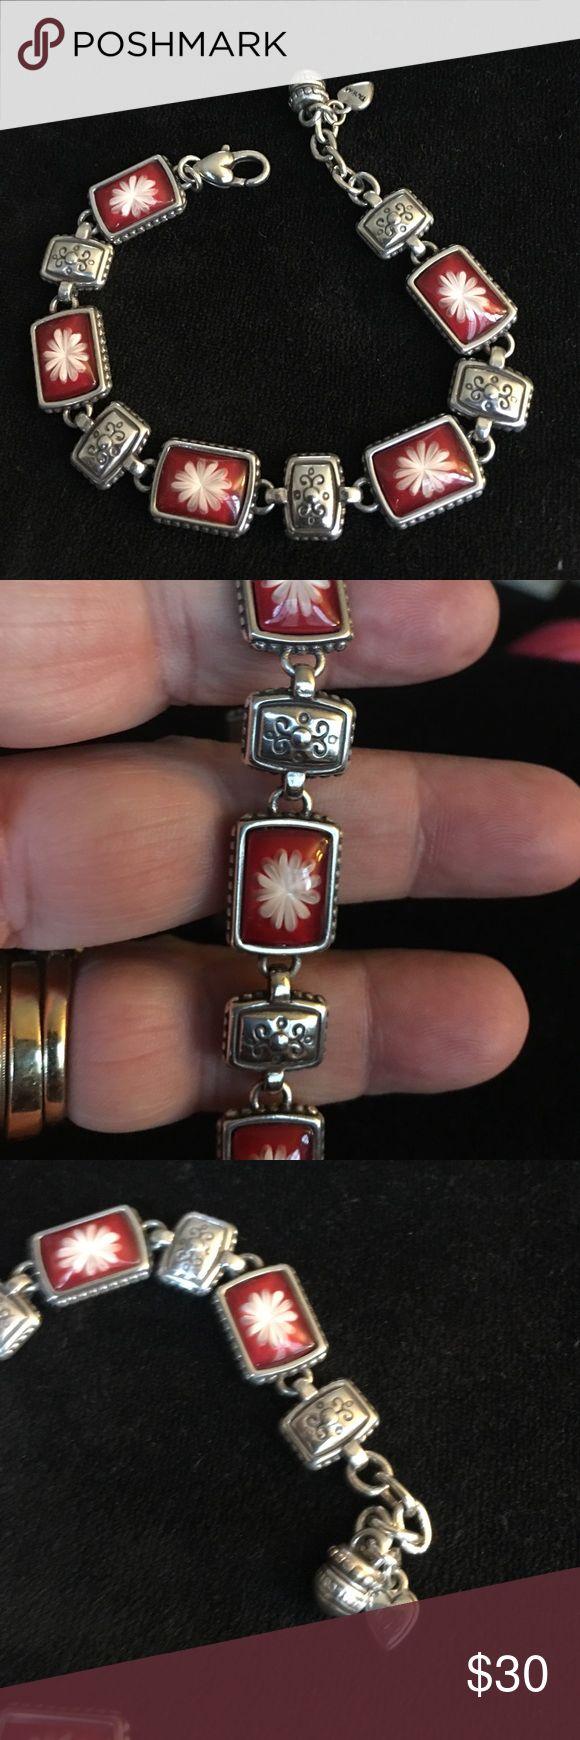 Brighton silver and red flower bracelet Brighton silver and red flower bracelet Brighton Jewelry Bracelets